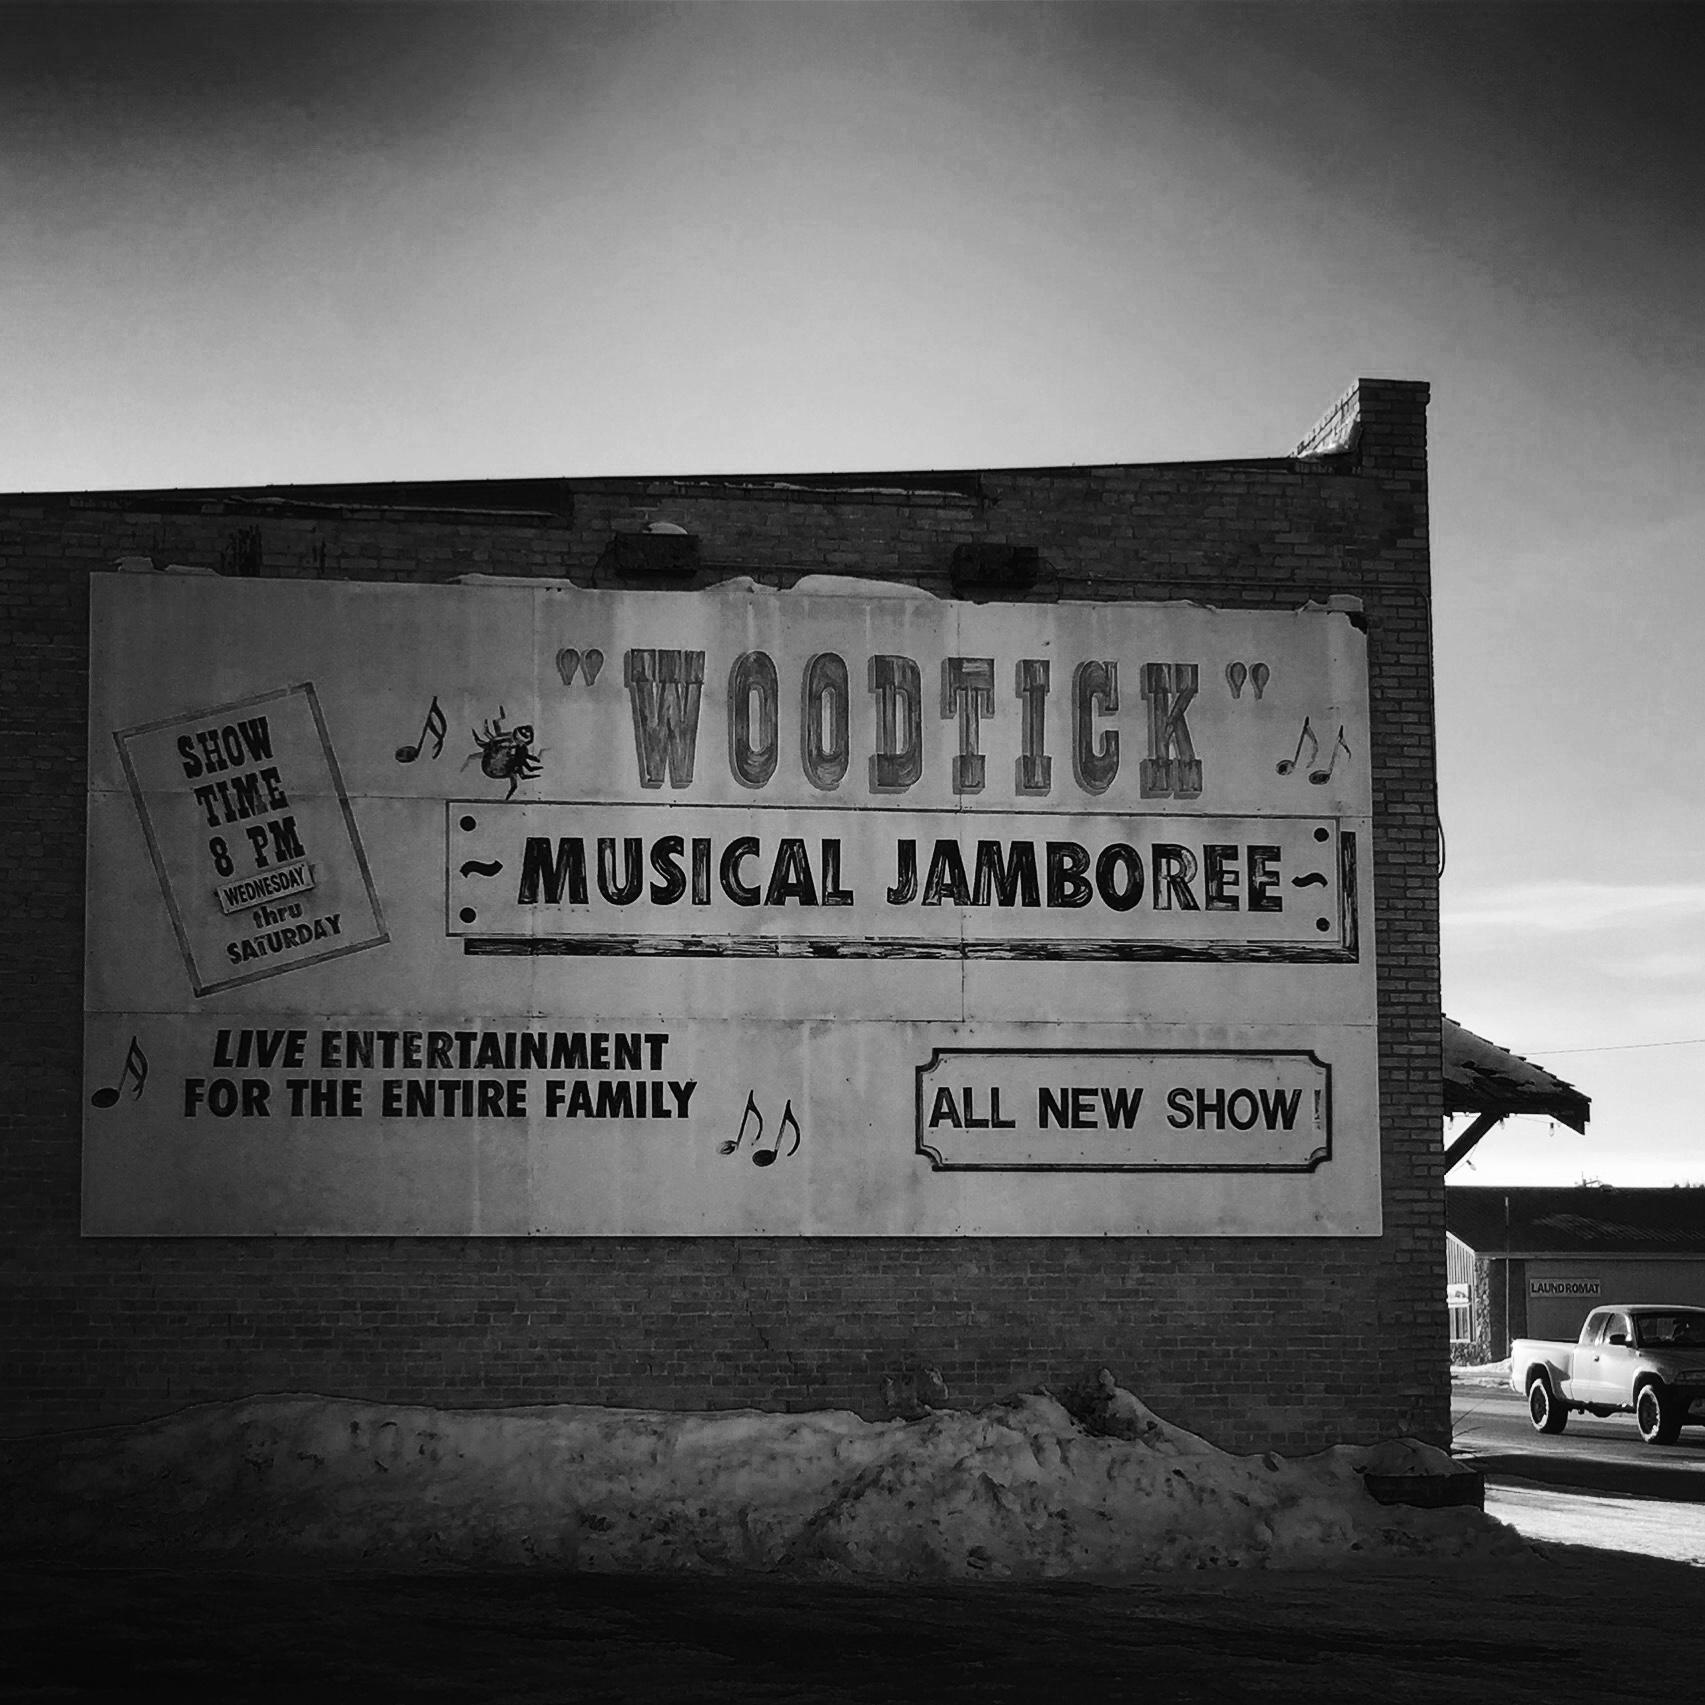 Woodtick Theater http://www.woodtick-theater.com/ Akeley, Minnesota (c) Heidi Jeub, 2017